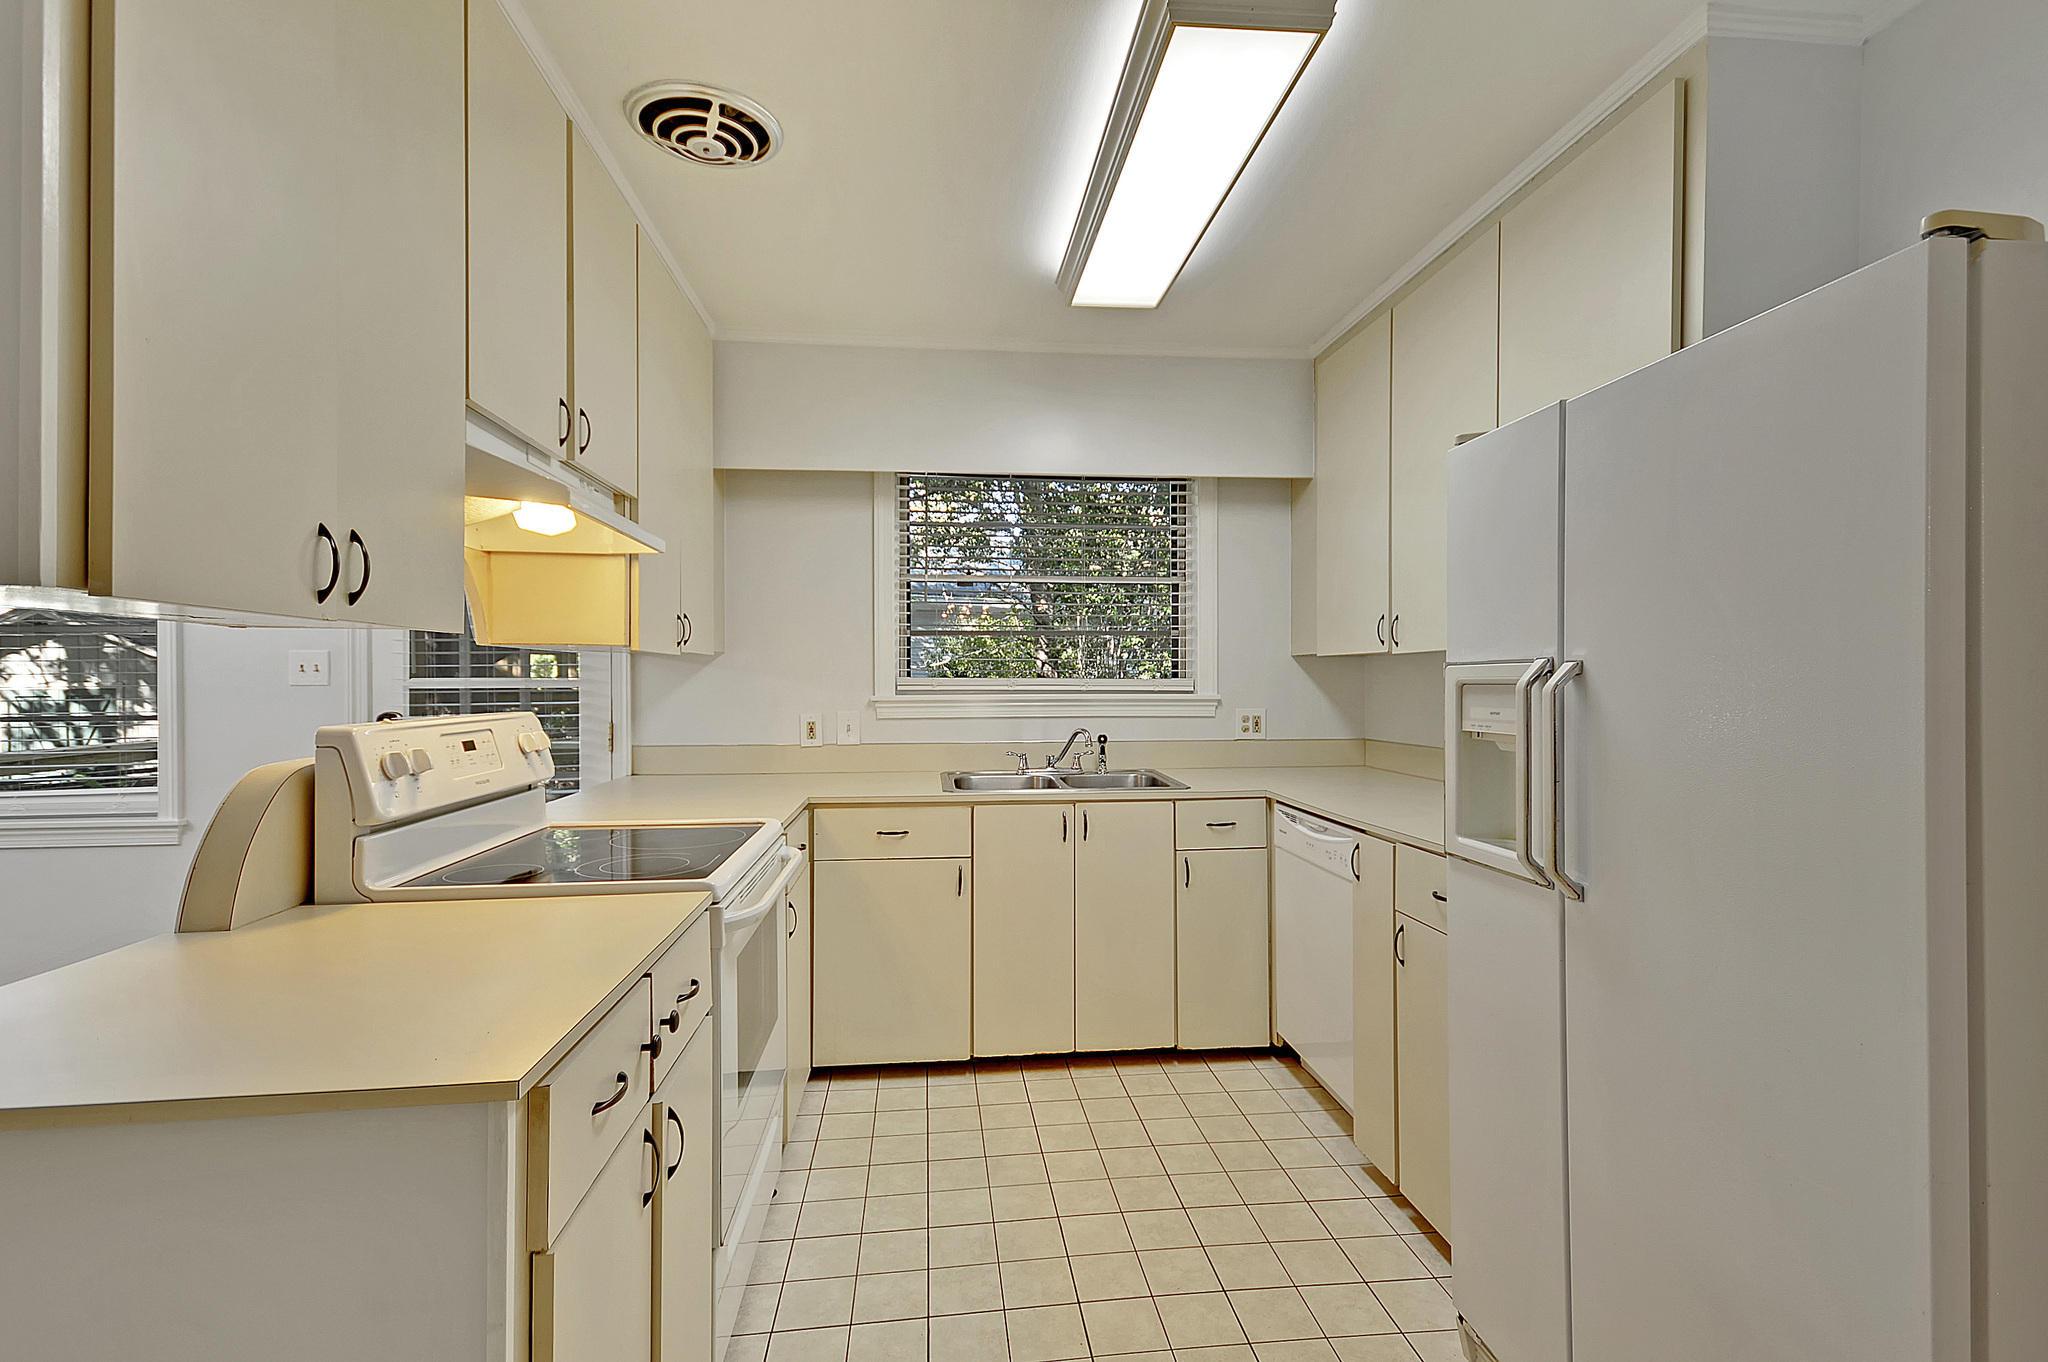 Edgewater Park Homes For Sale - 1356 Emory, Charleston, SC - 44